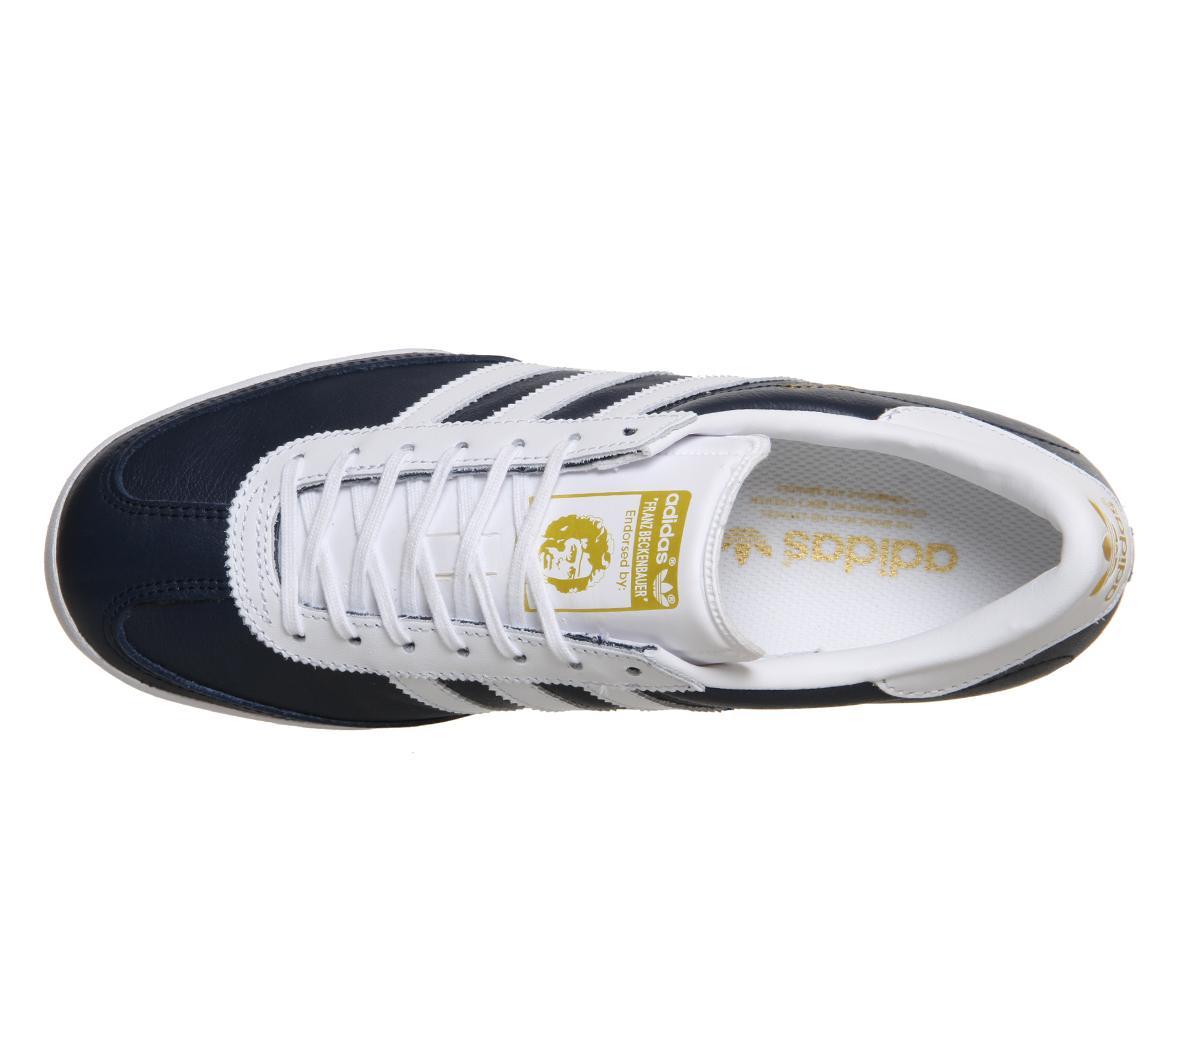 Adidas Beckenbauer Shoes Australia